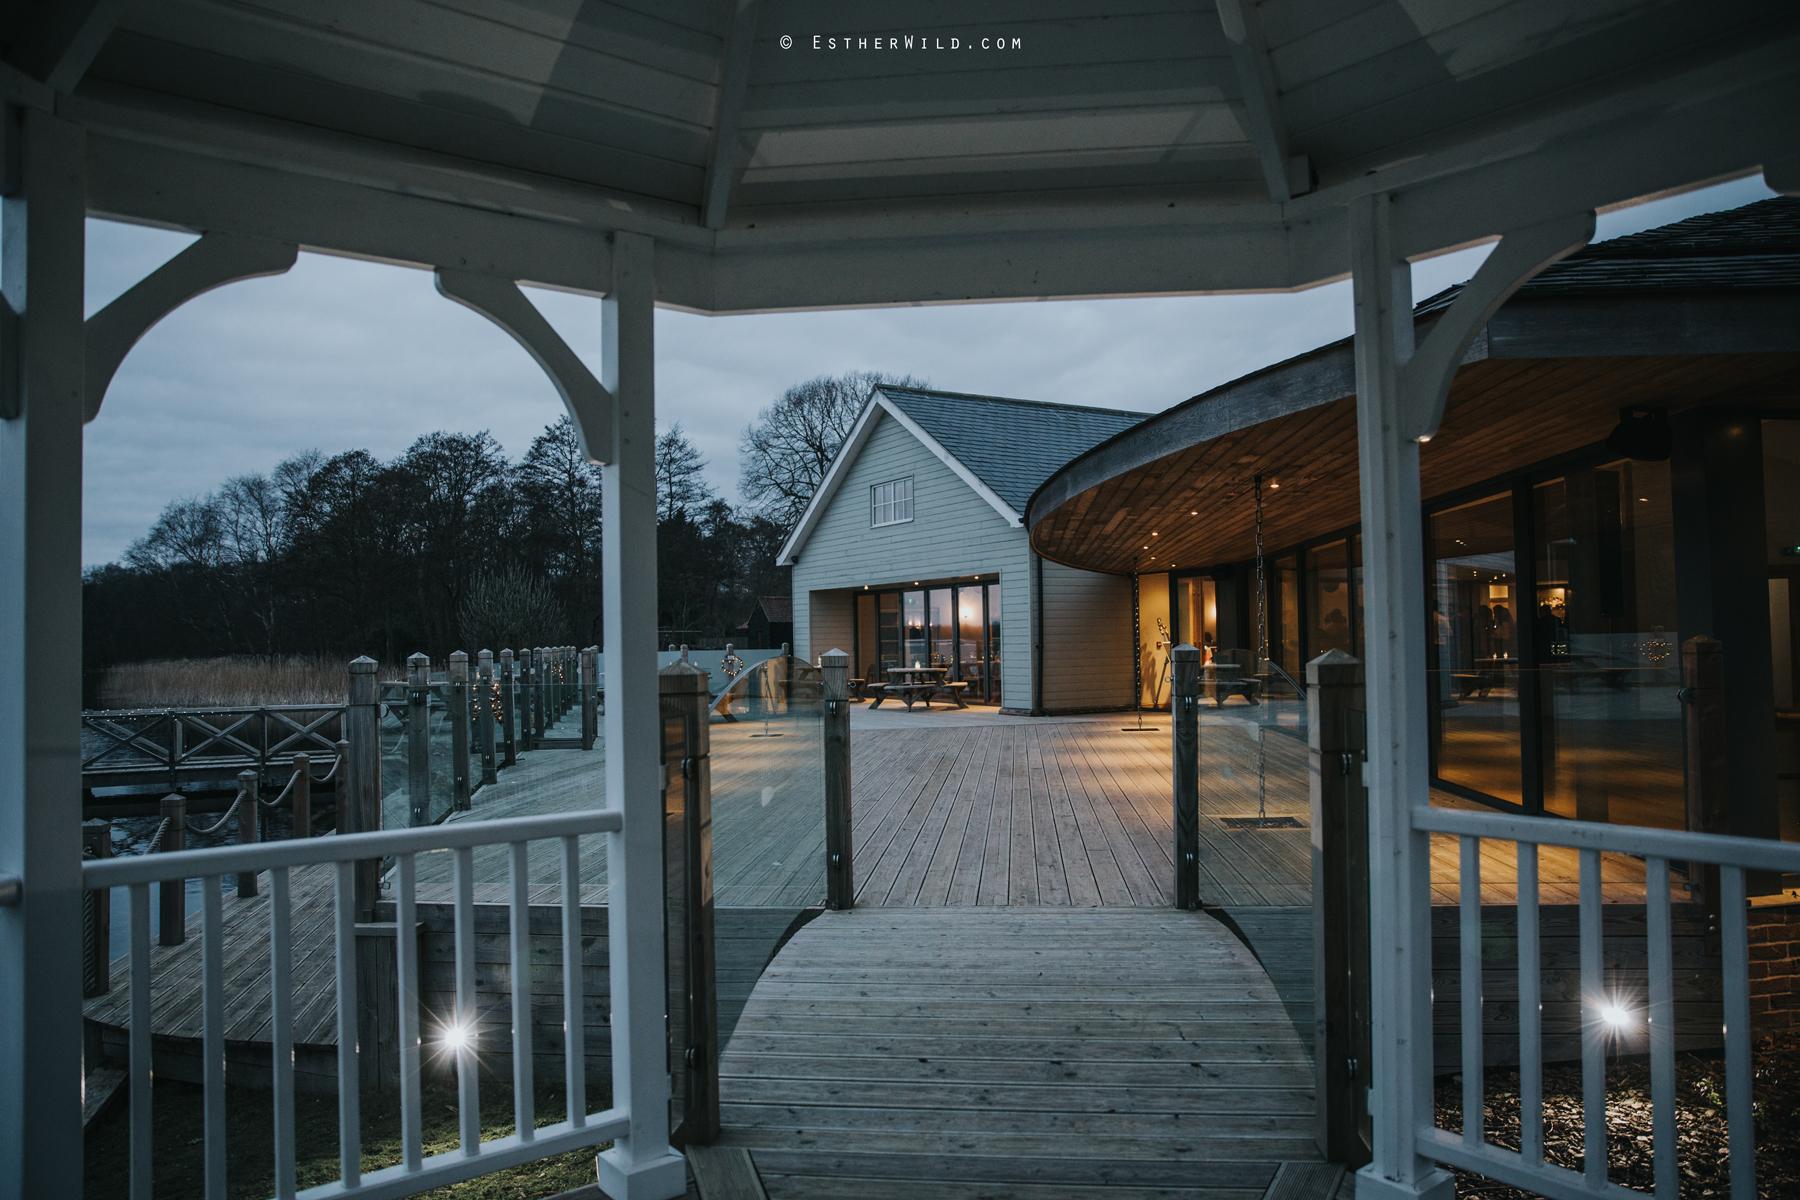 The_BoatHouse_Wedding_Venue_Ormesby_Norfolk_Broads_Boat_Wedding_Photography_Esther_Wild_Photographer_IMG_3350.jpg